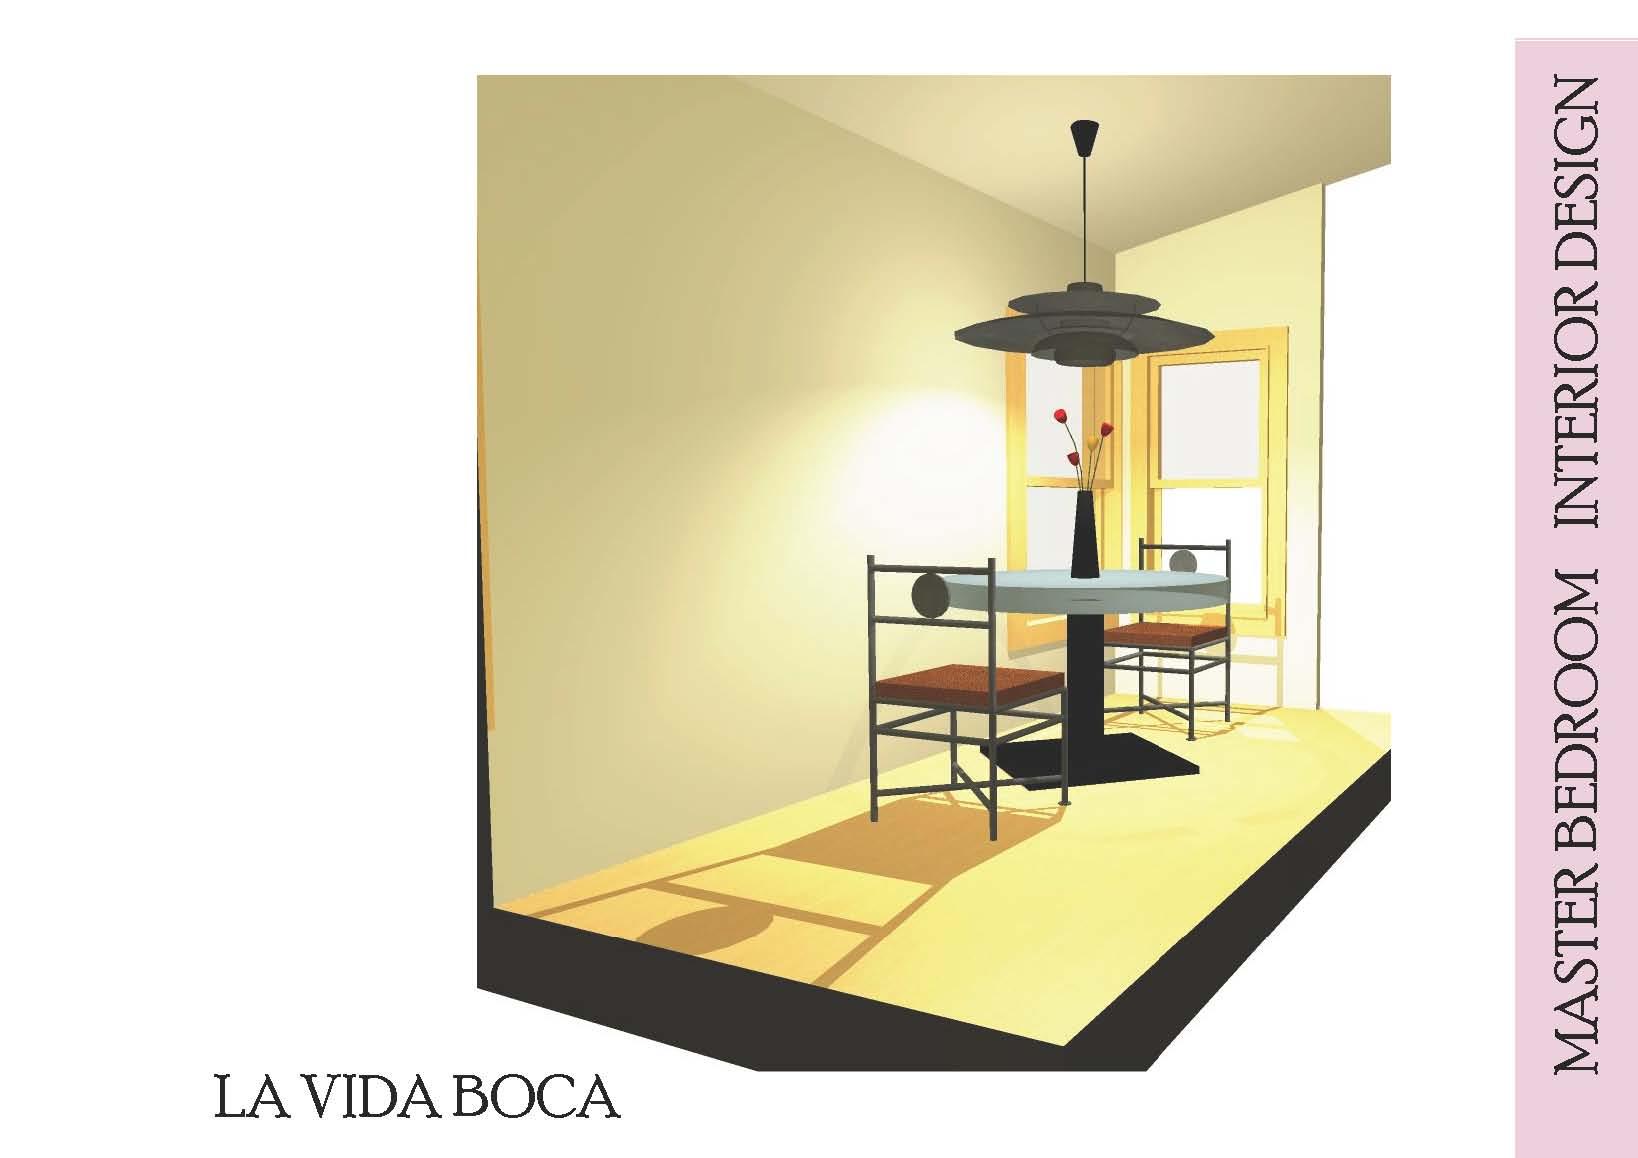 Home Interior Design Project Designed By Capraru Roxana La Vida Boca Boca Raton Florida